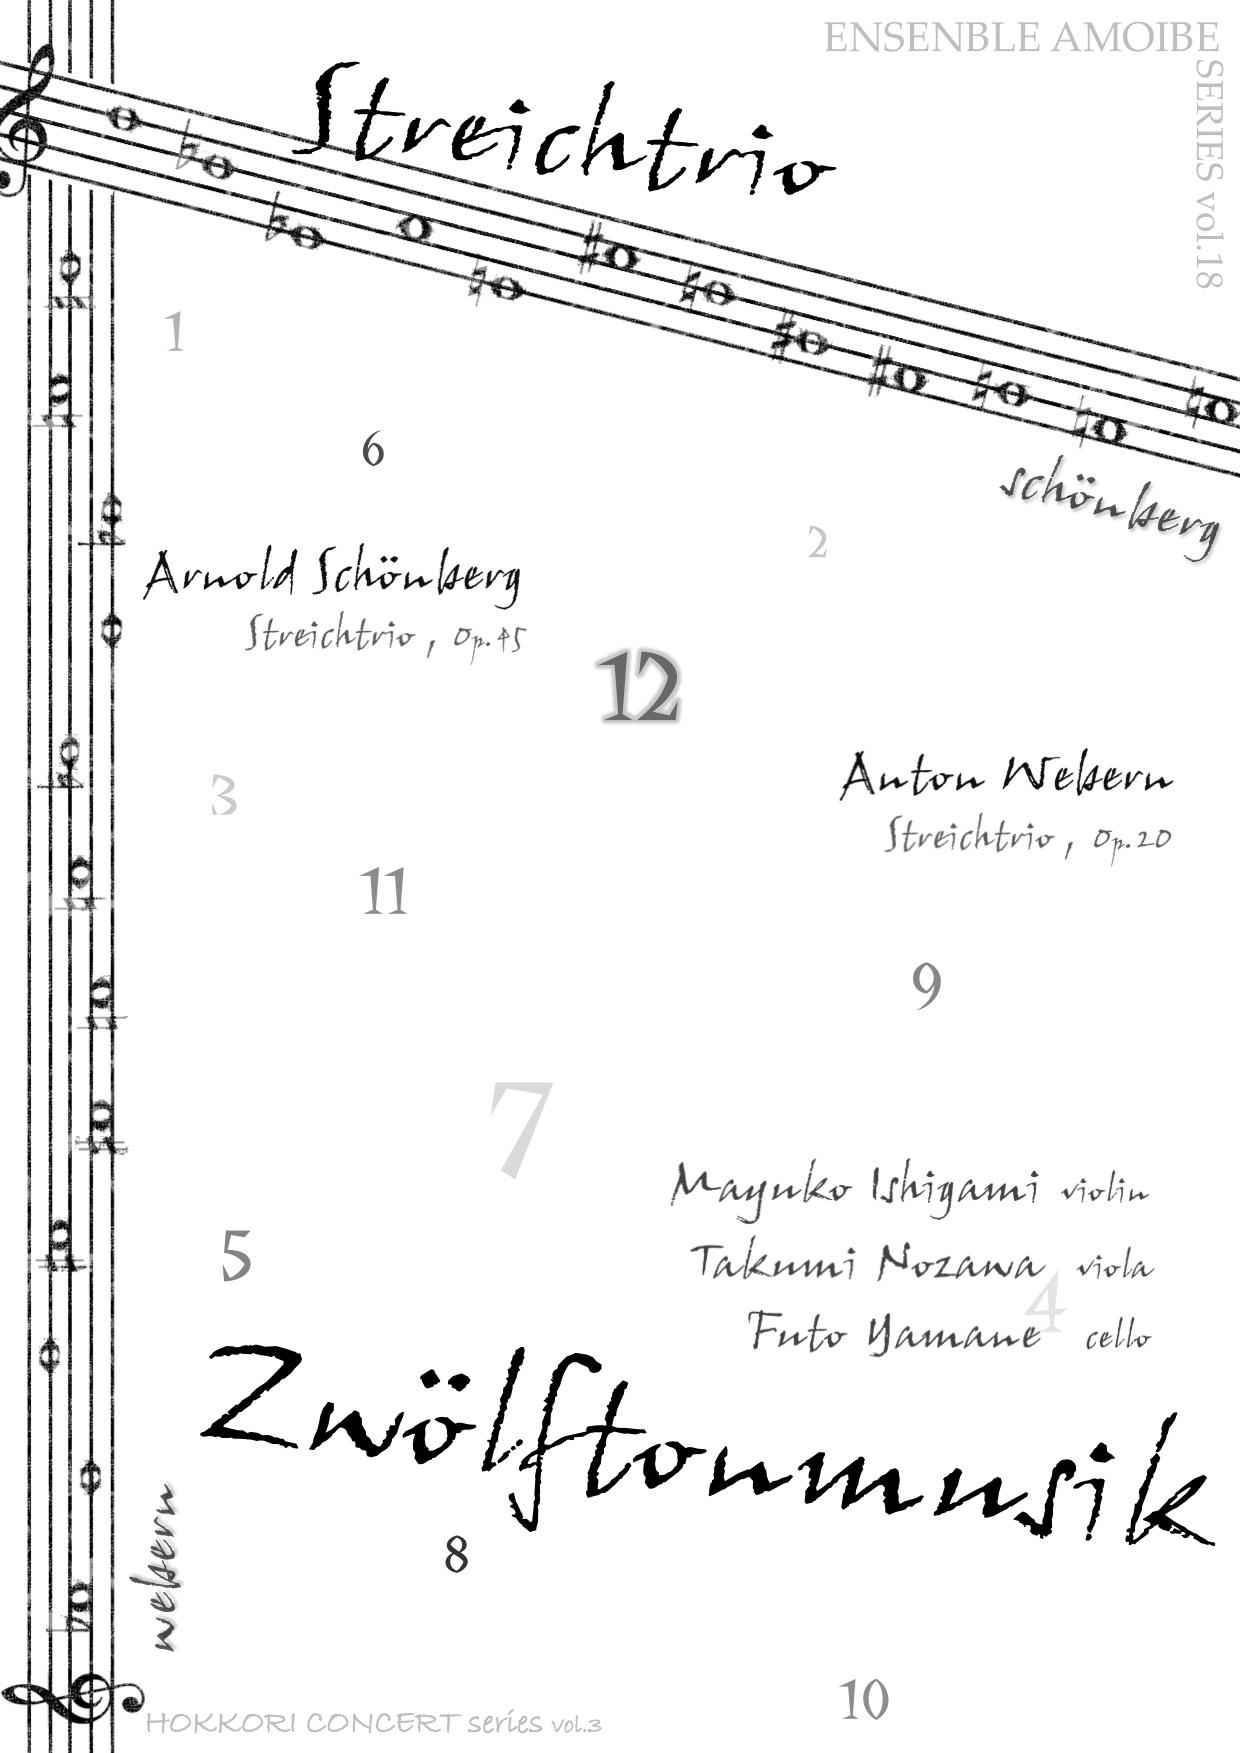 Ensemble Amoibe第18回公演 【HOKKORI CONCERT vol.3】